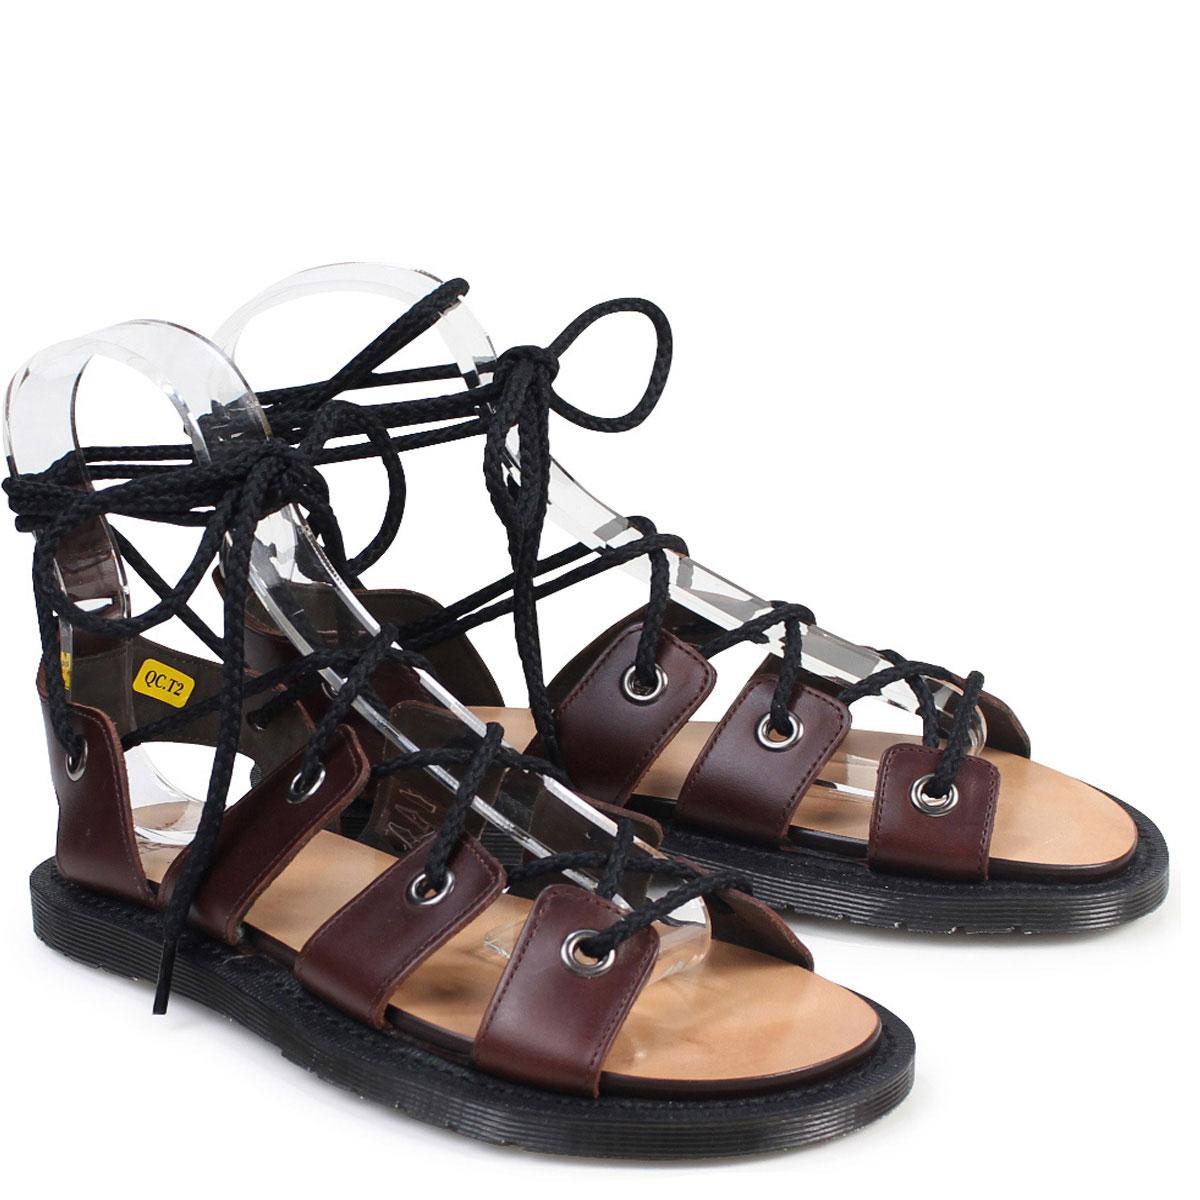 5fe83d4f5a1 Dr.Martens sandals Lady s doctor Martin WOMENS JASMINE GHILLIE SANDAL  R22239220 brown  176